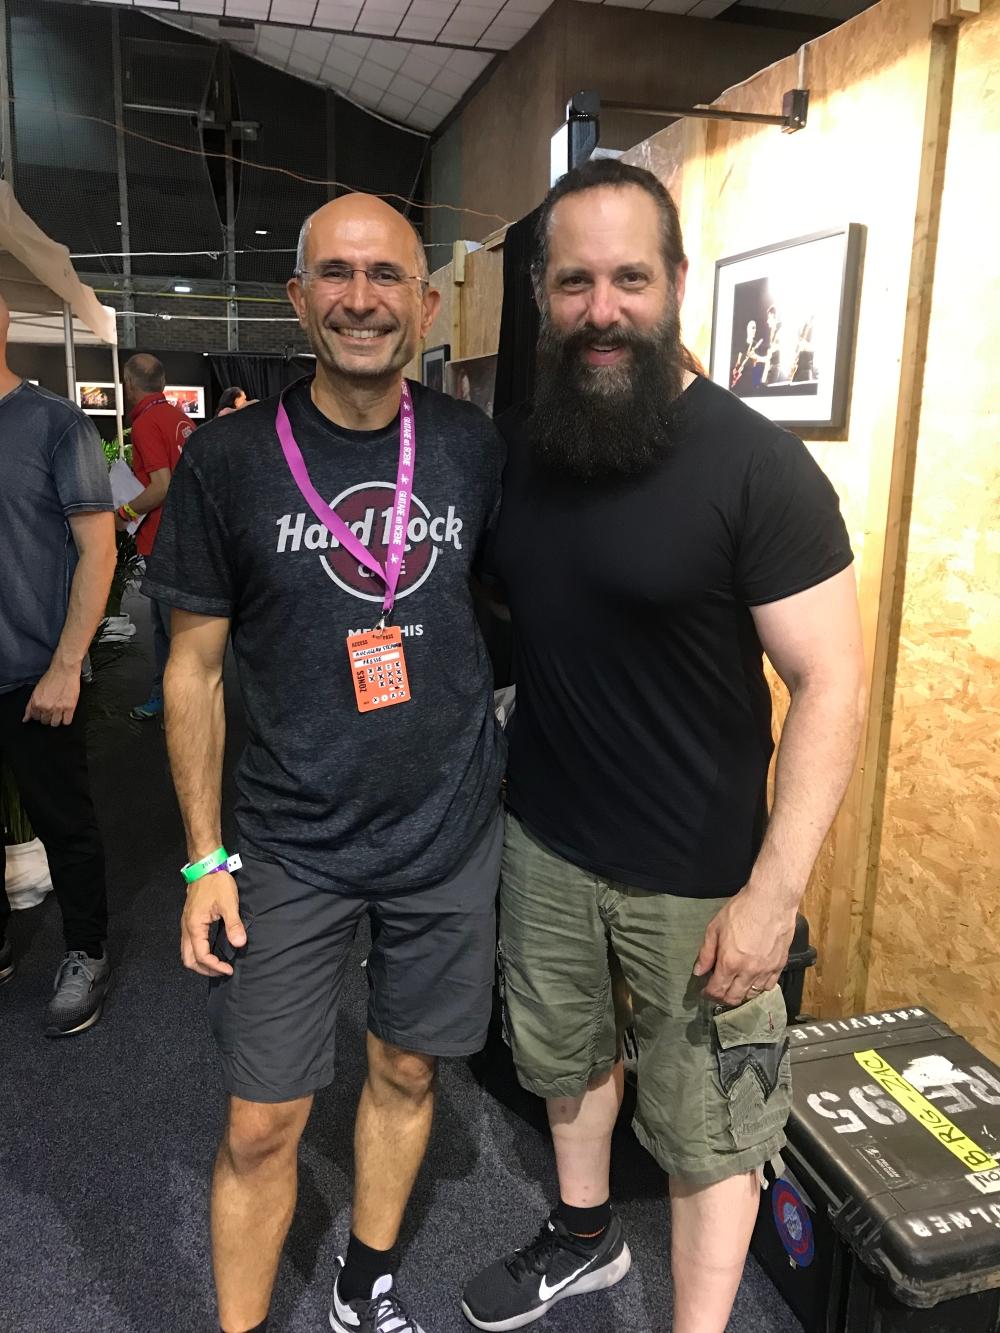 JP et SA Guitare en scene juillet 2019.jpg